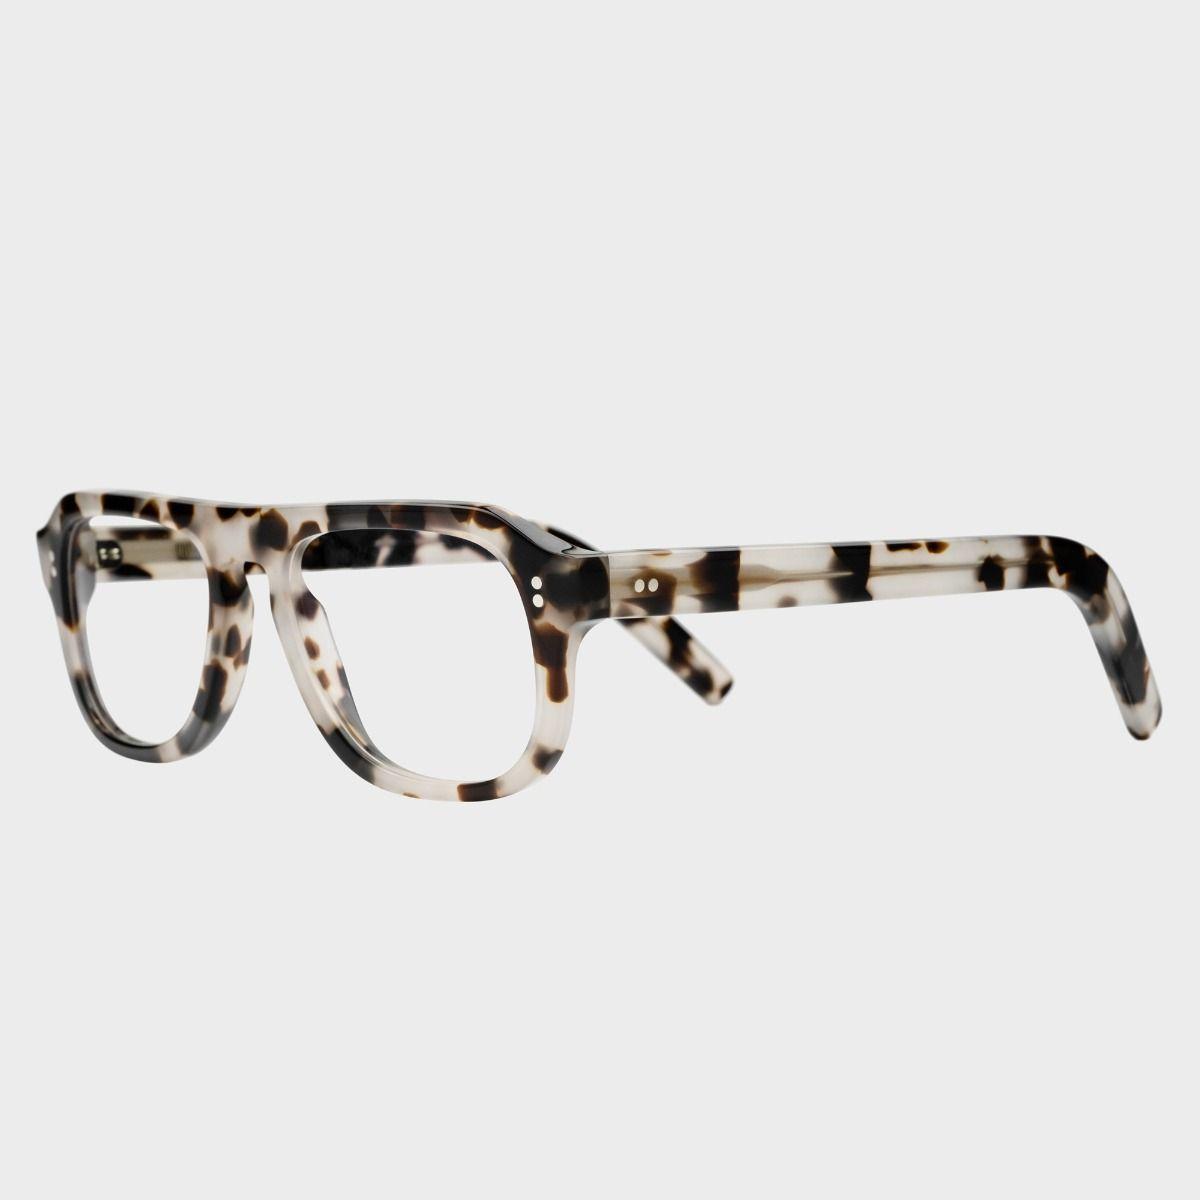 0822 Optical Aviator Glasses-Jet Engine Grey